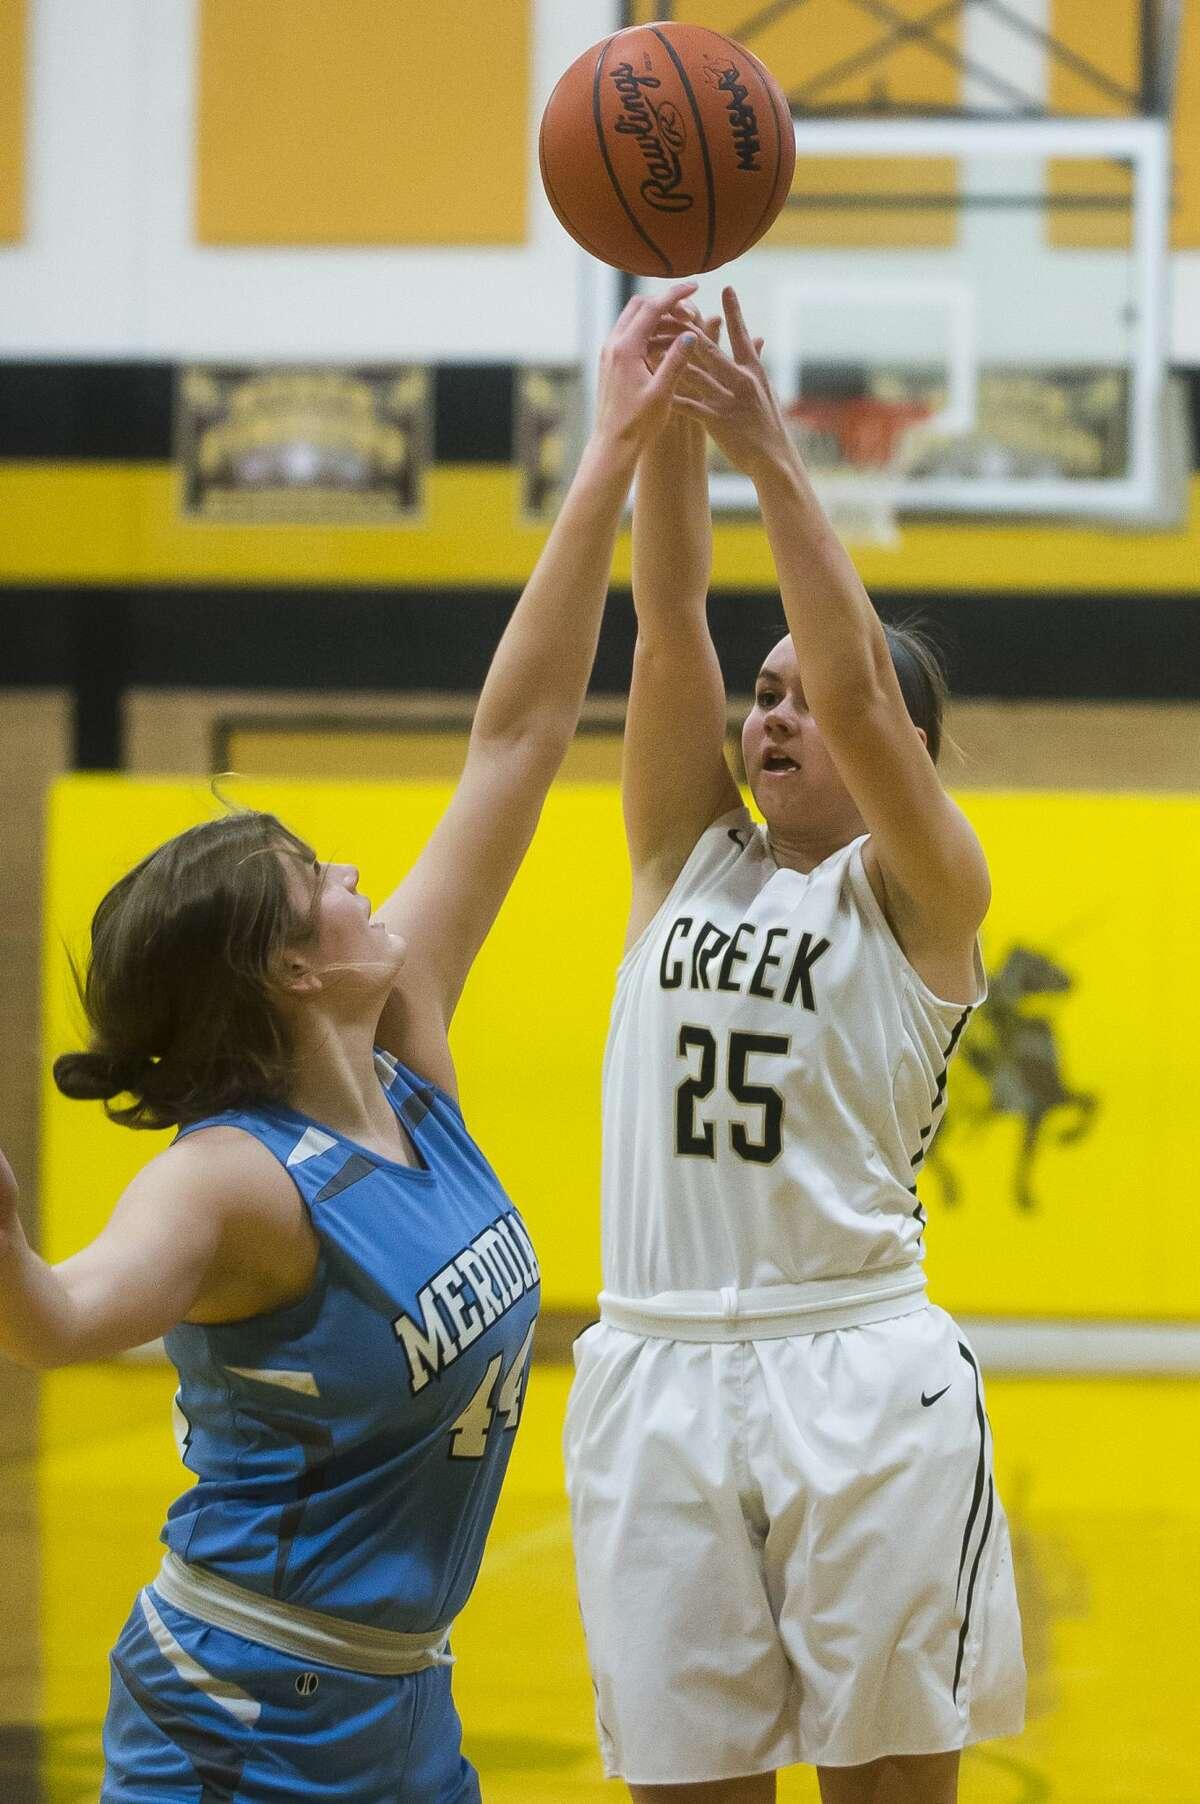 Bullock Creek senior Reegan Carey takes a shot as Meridian junior Baleigh Hill guards her during their game on Tuesday, Jan. 23, 2018 at Bullock Creek High School. Bullock Creek won 42-33. (Katy Kildee/kkildee@mdn.net)